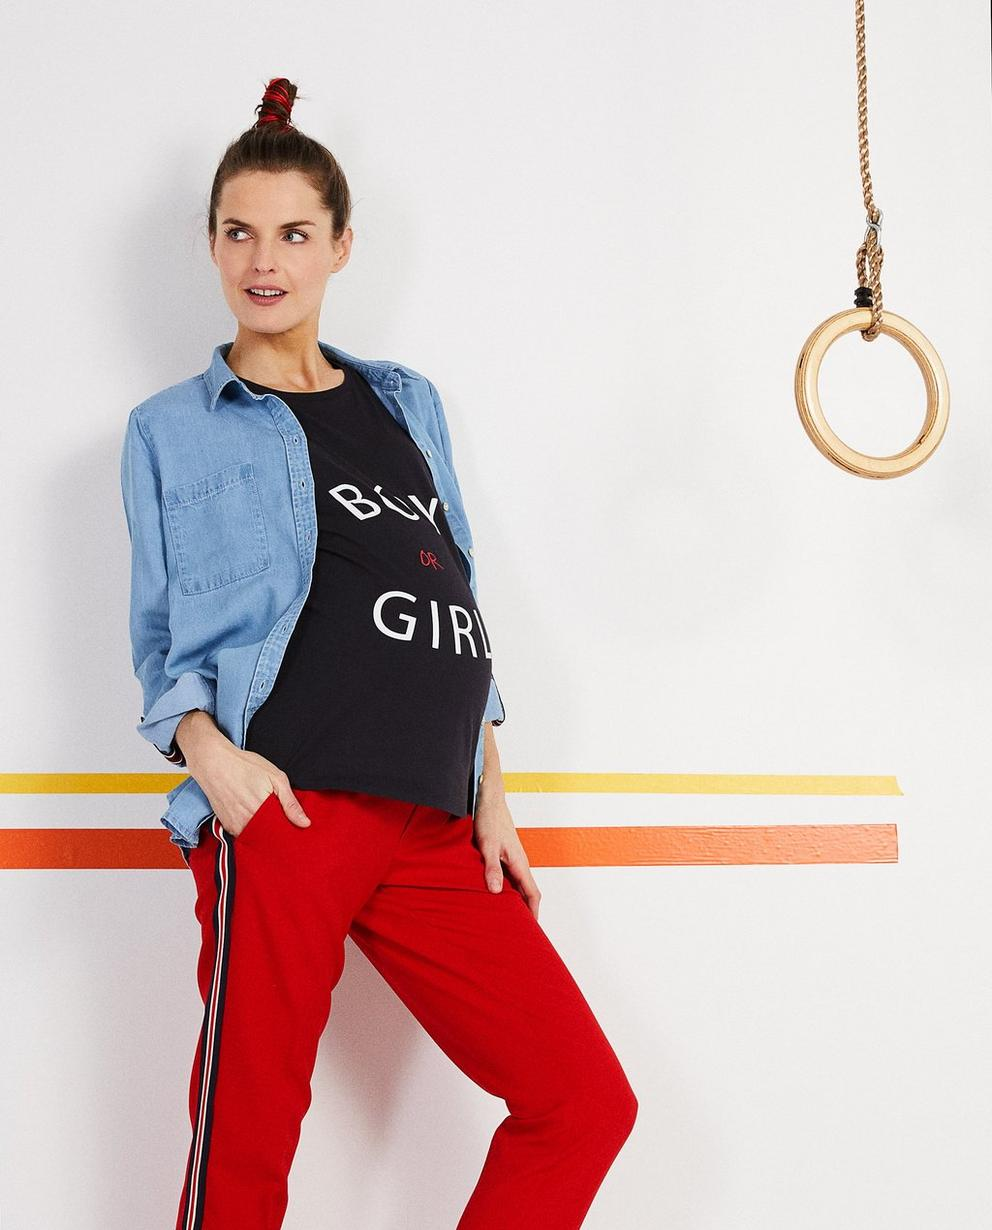 Hemden - Aqua - Jeanshemd aus Lyocell